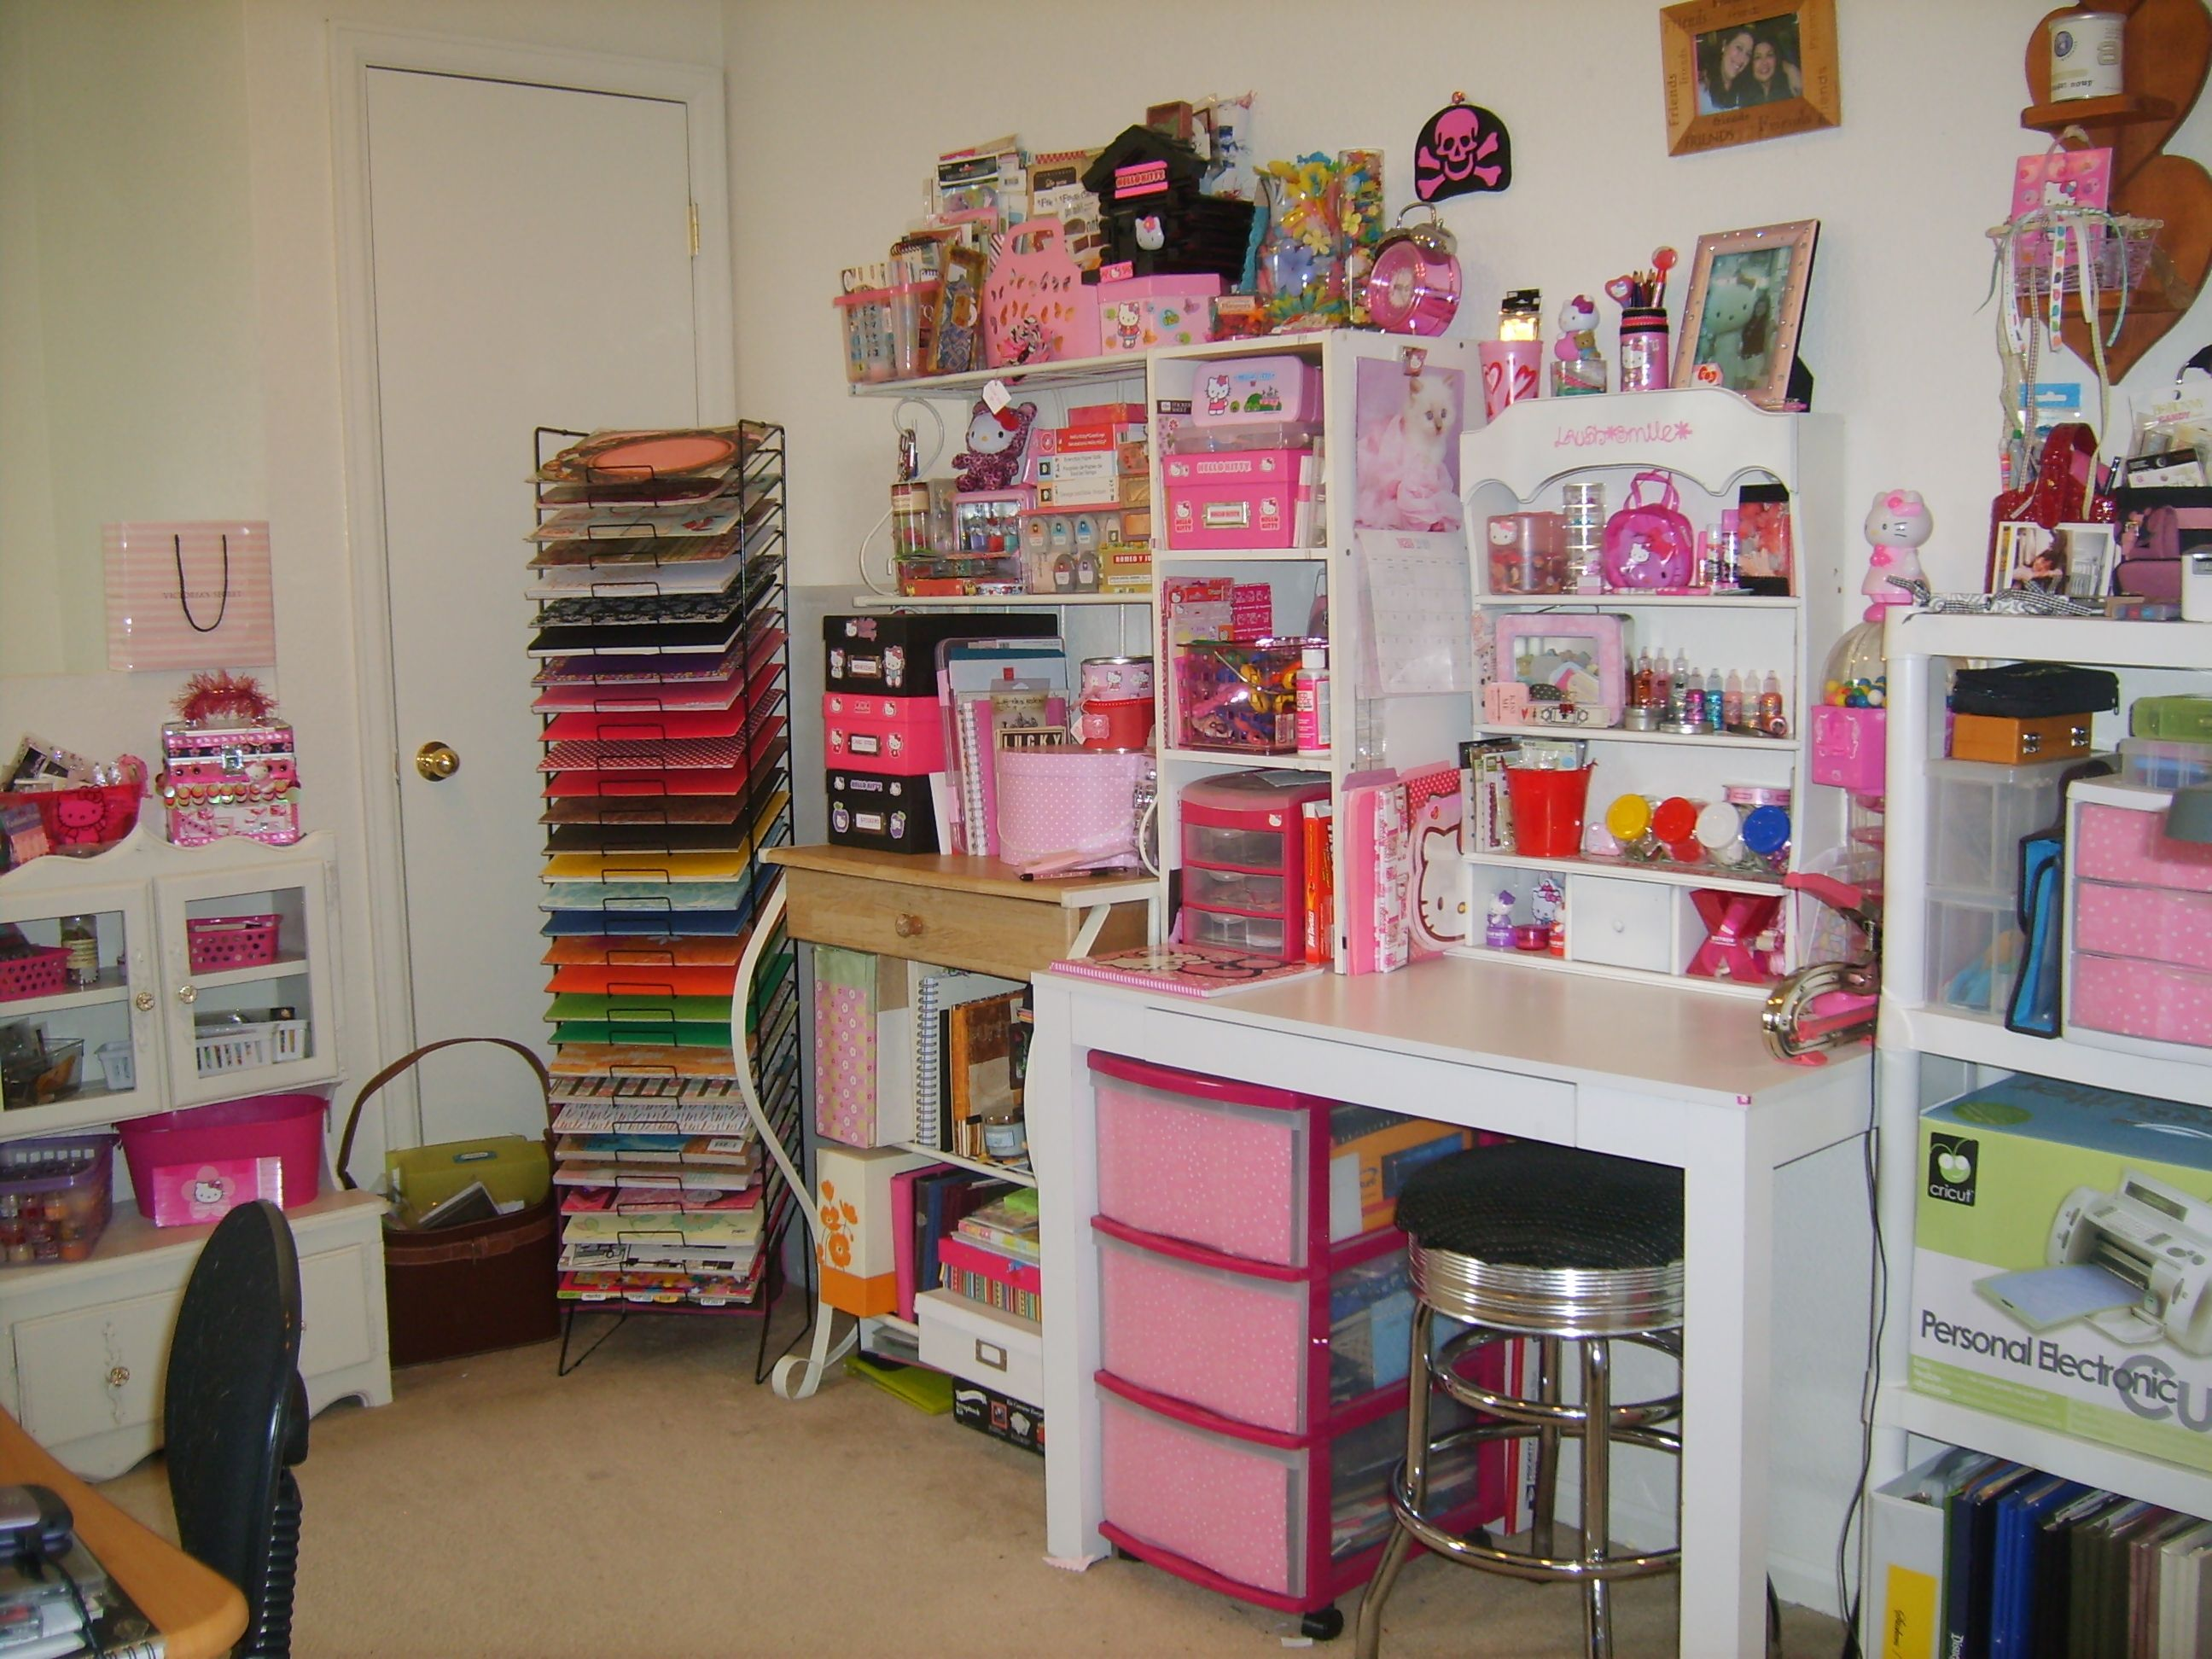 Scrapbook room ideas - Explore Scrapbook Rooms My Scrapbook And More